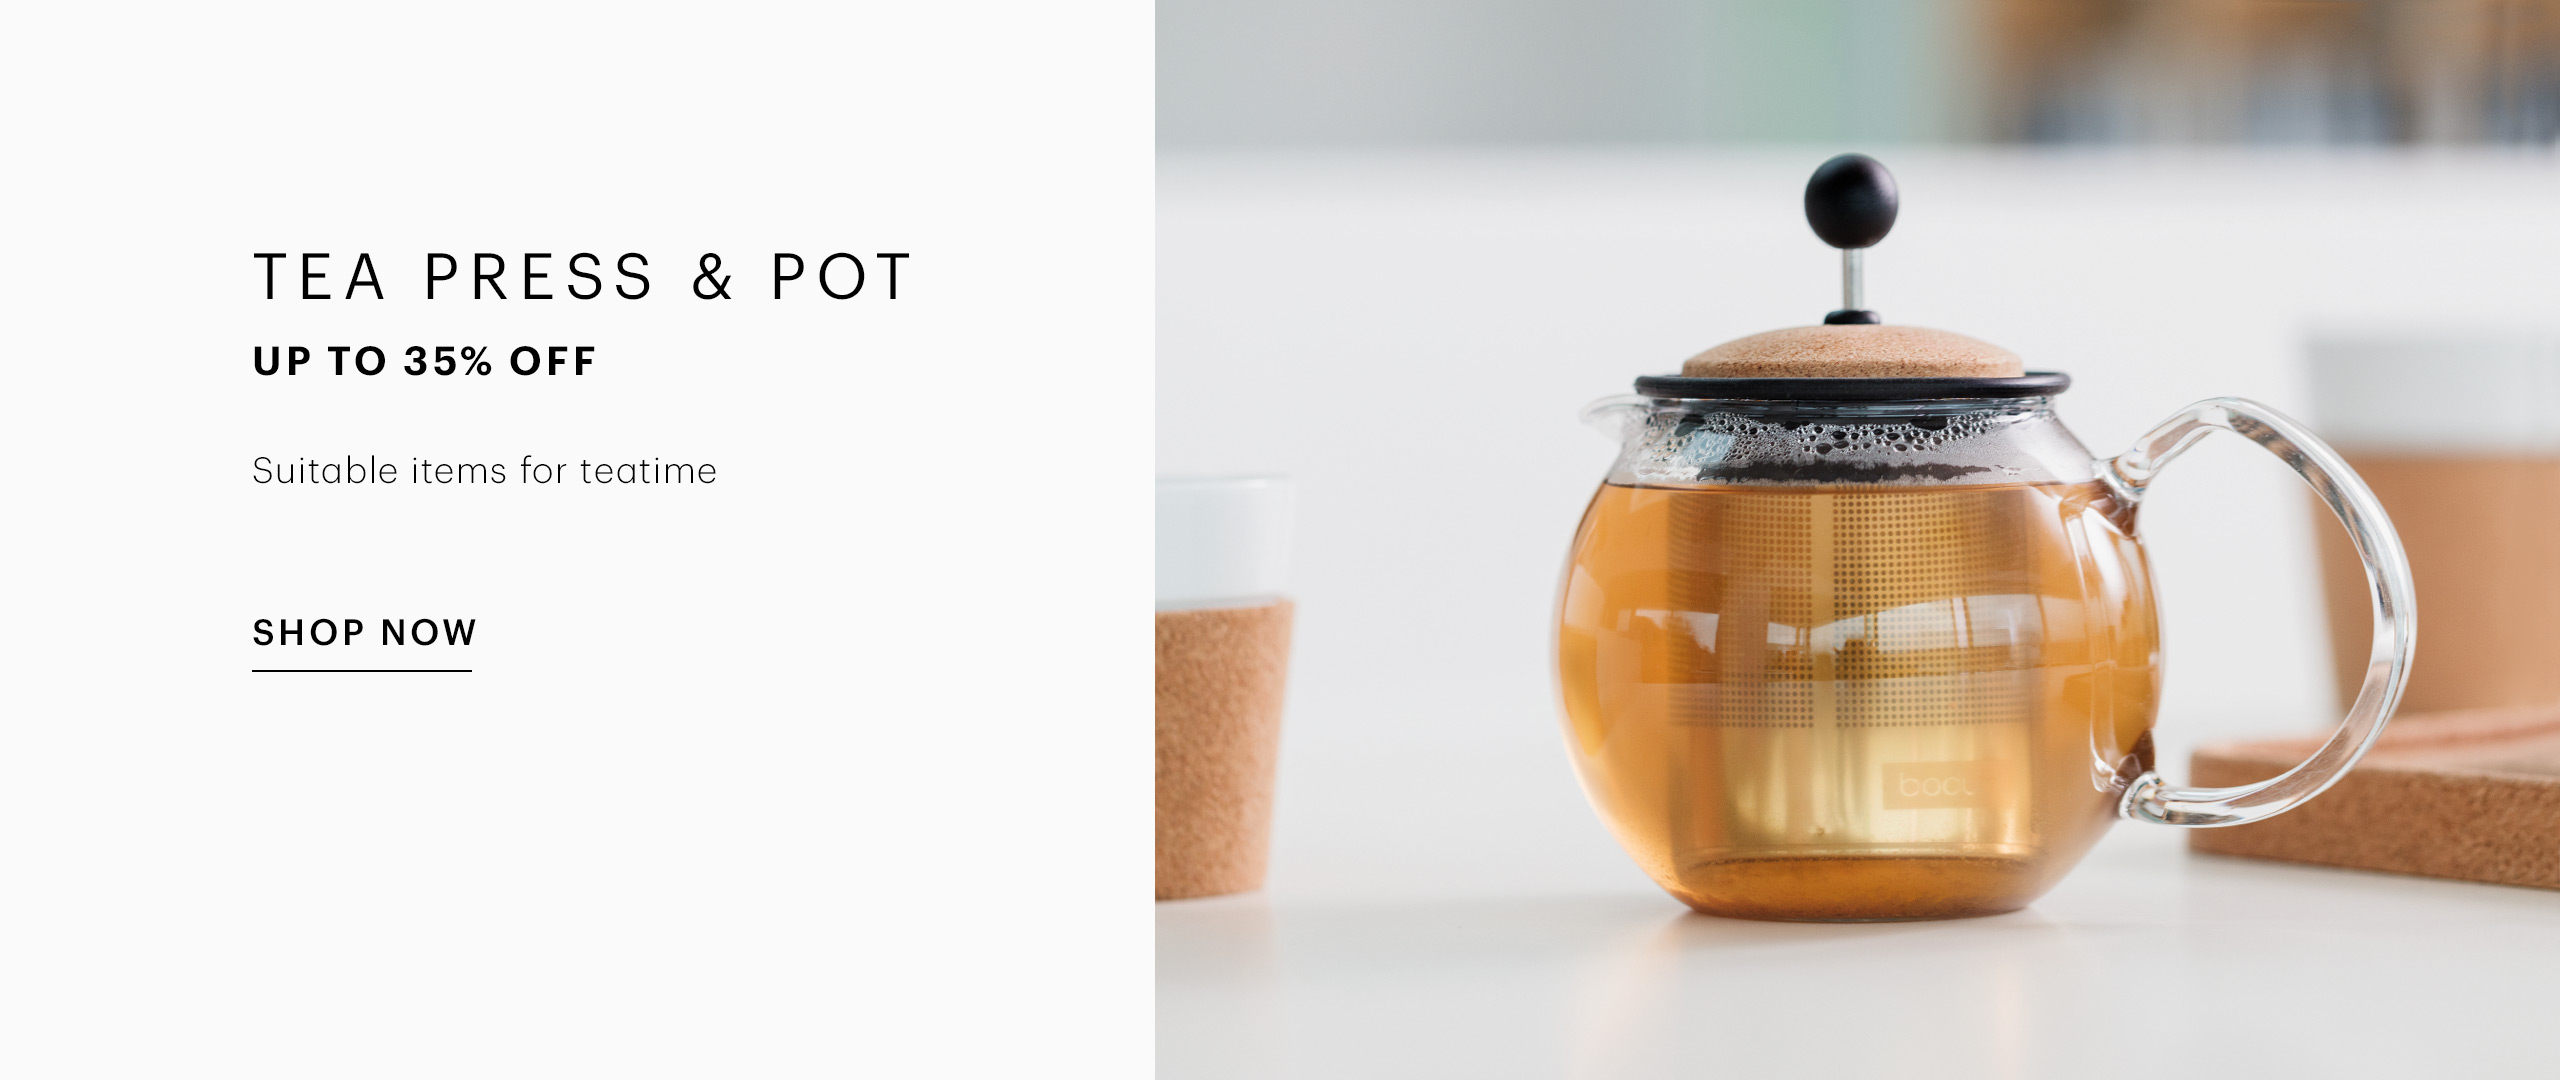 BUS - Press & Pot